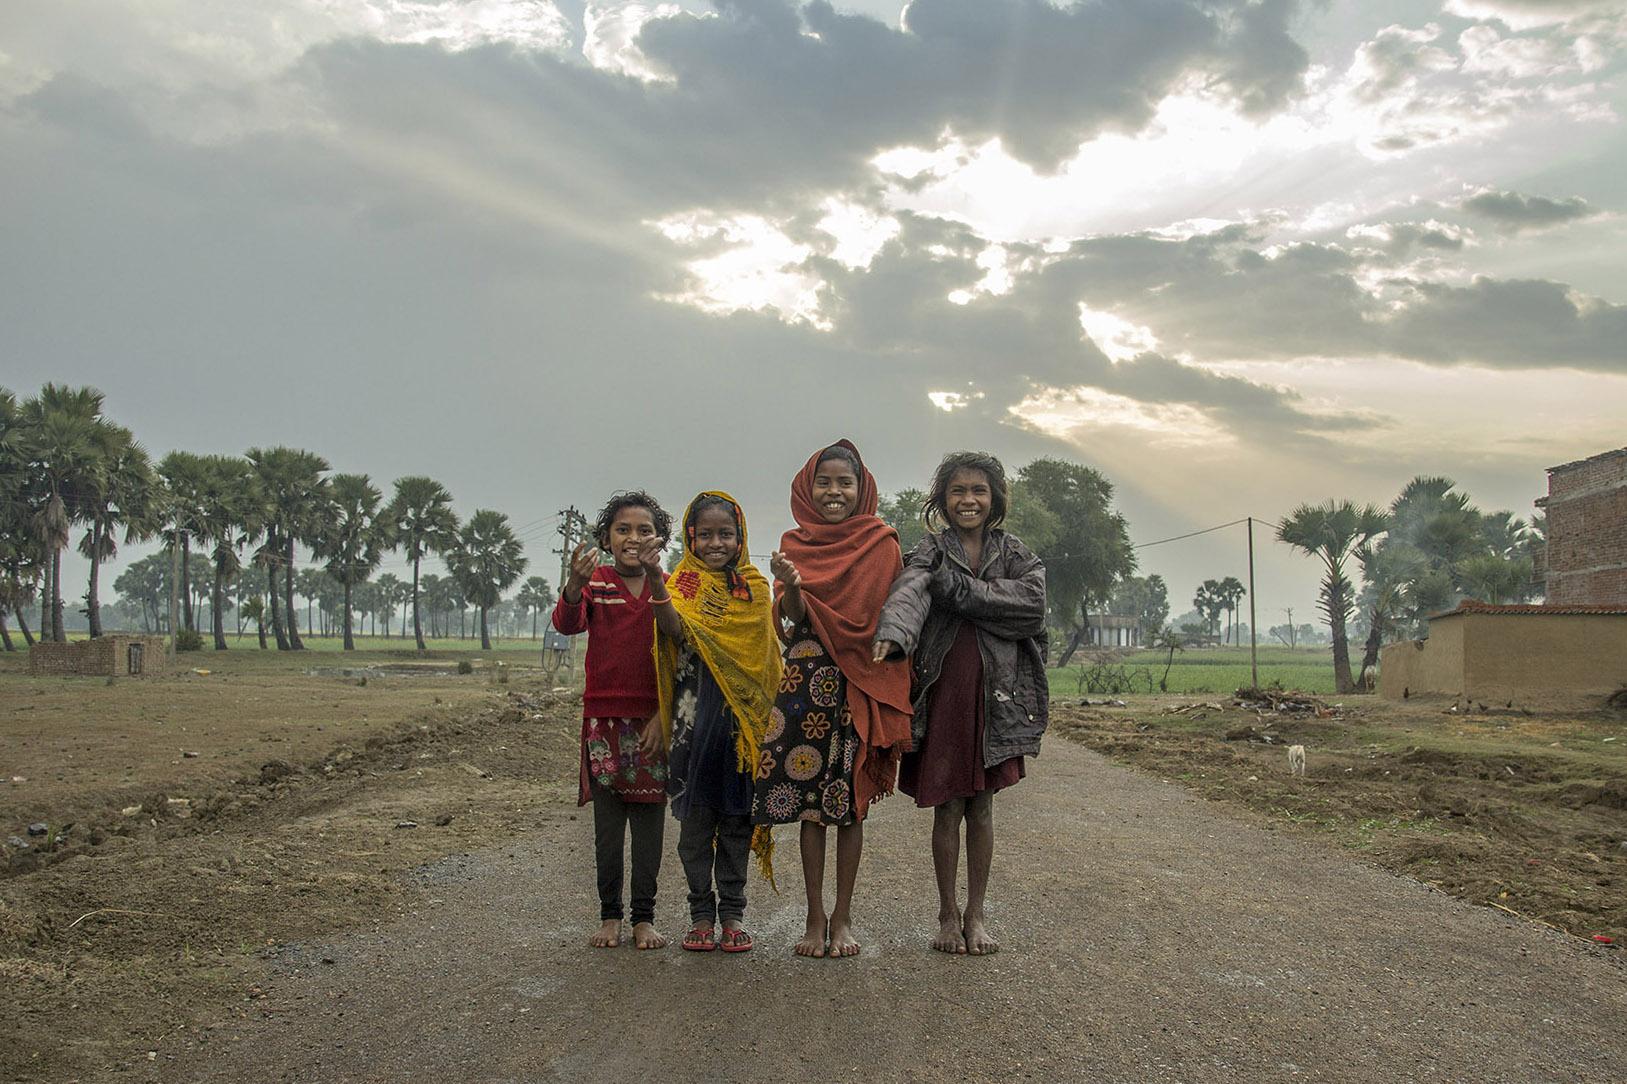 Village students of Bodhi Tree School